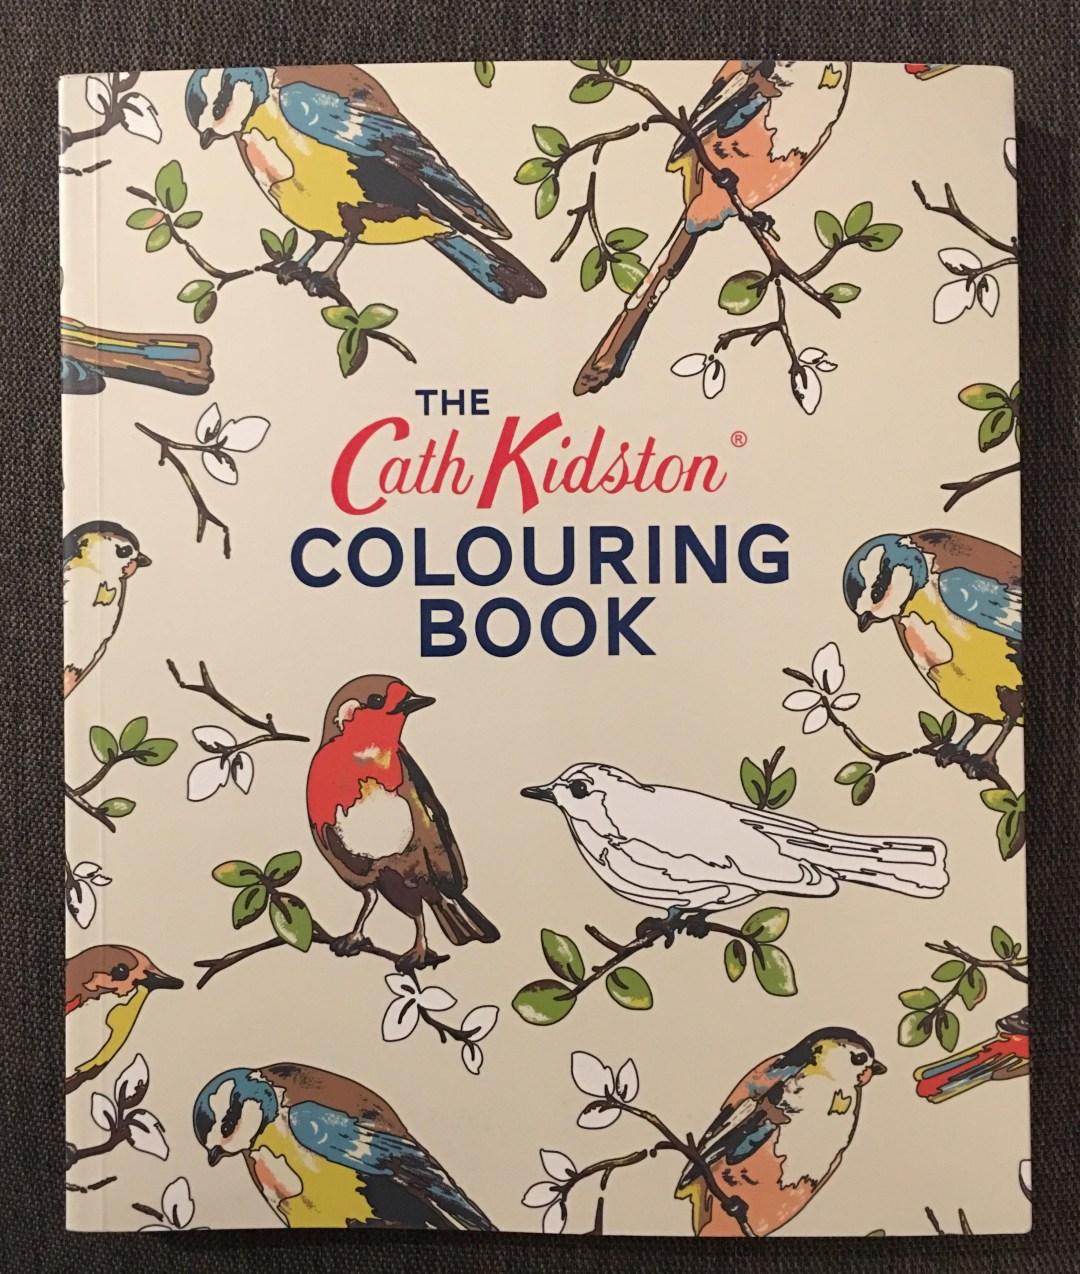 The Cath Kidston Classic Colouring Book